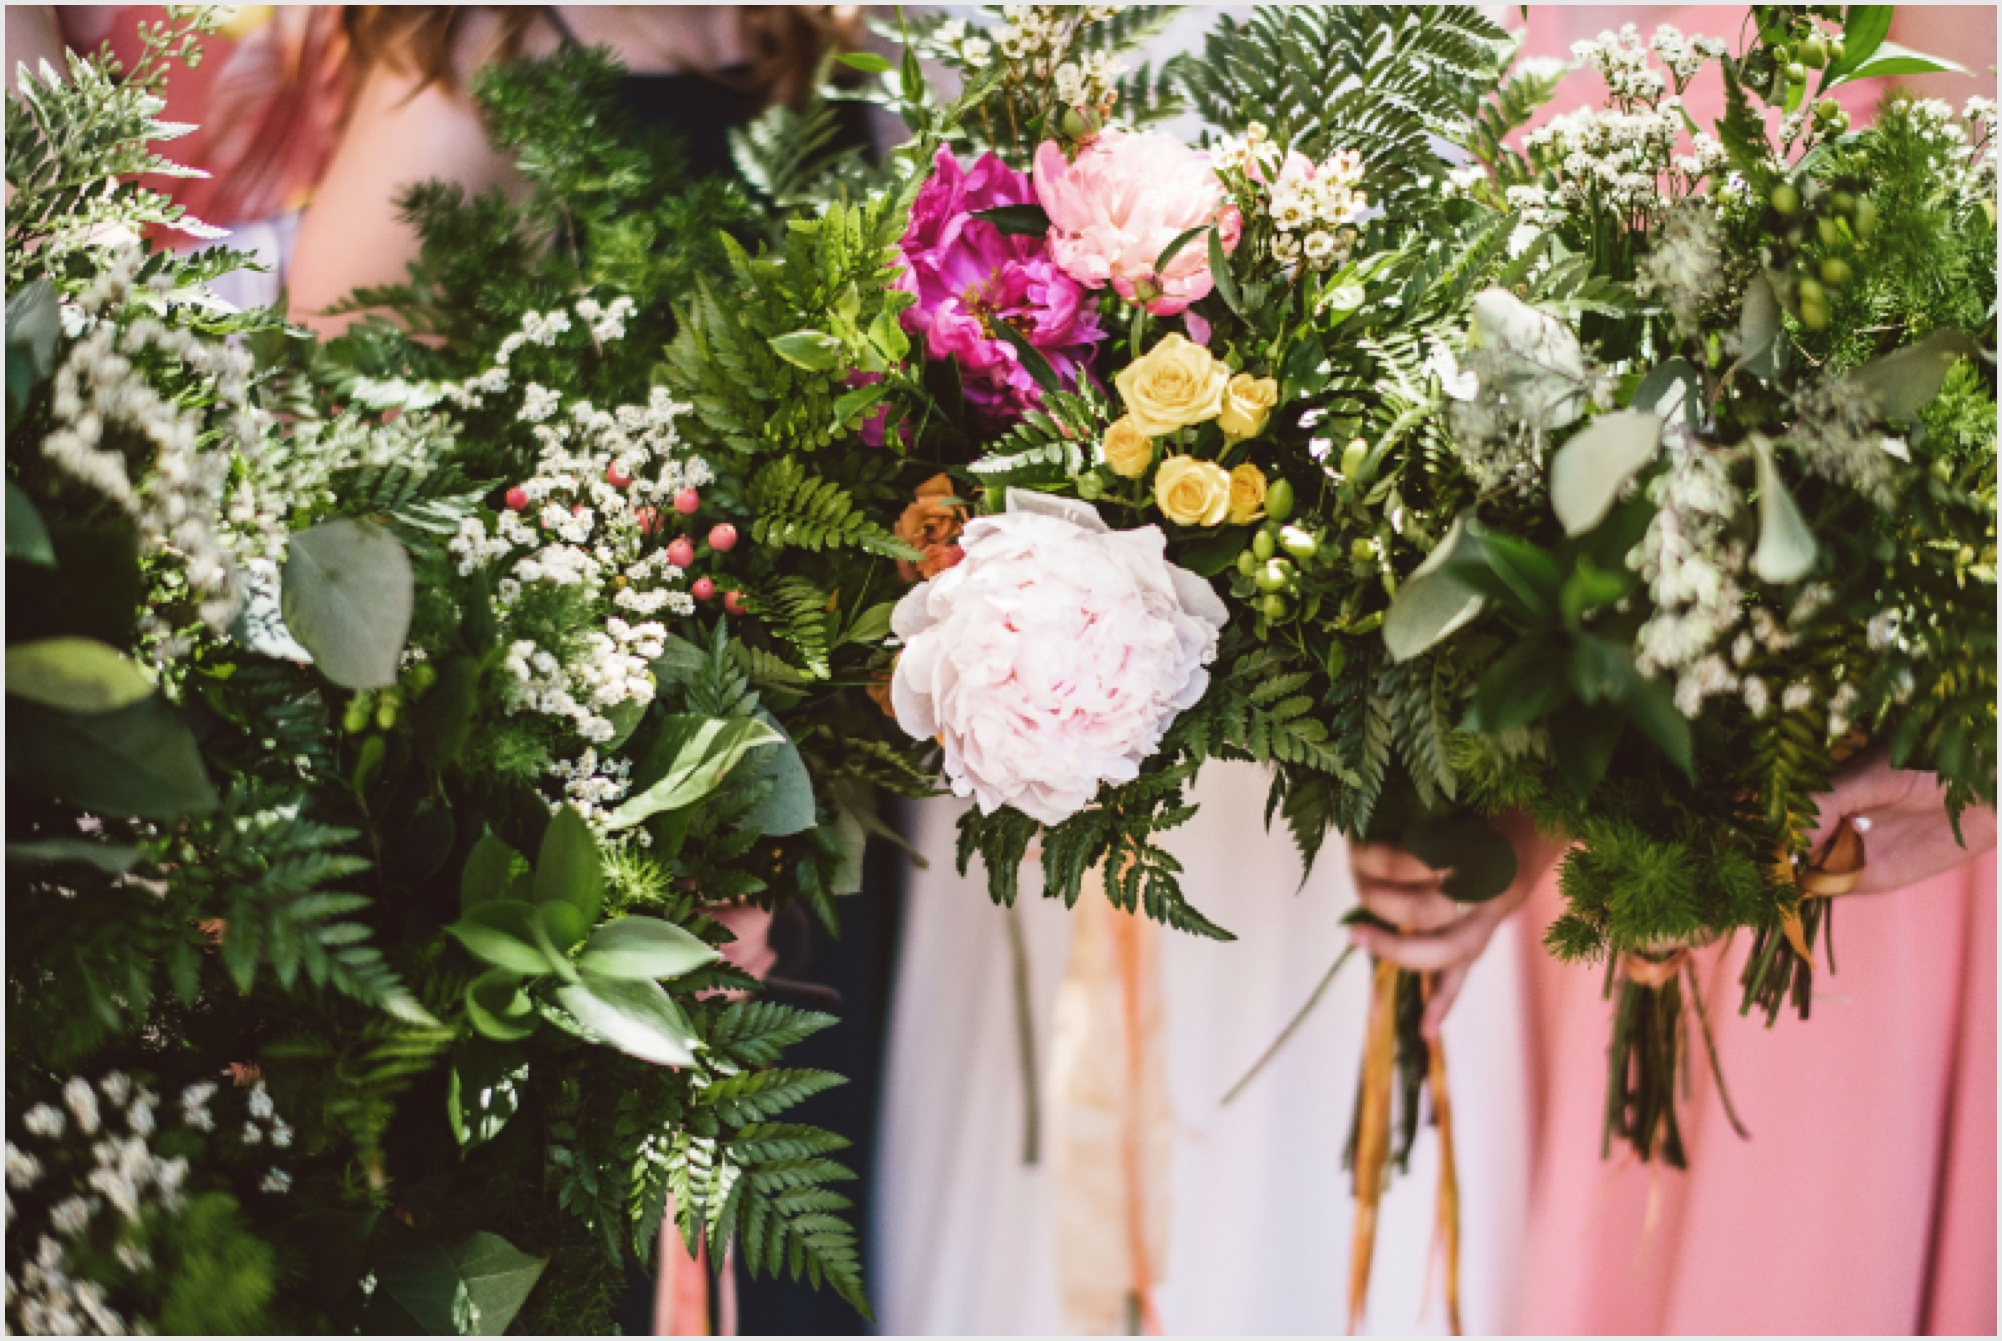 abby_taylor_minneapolis_wedding_lucas_botz_photography_141.jpg